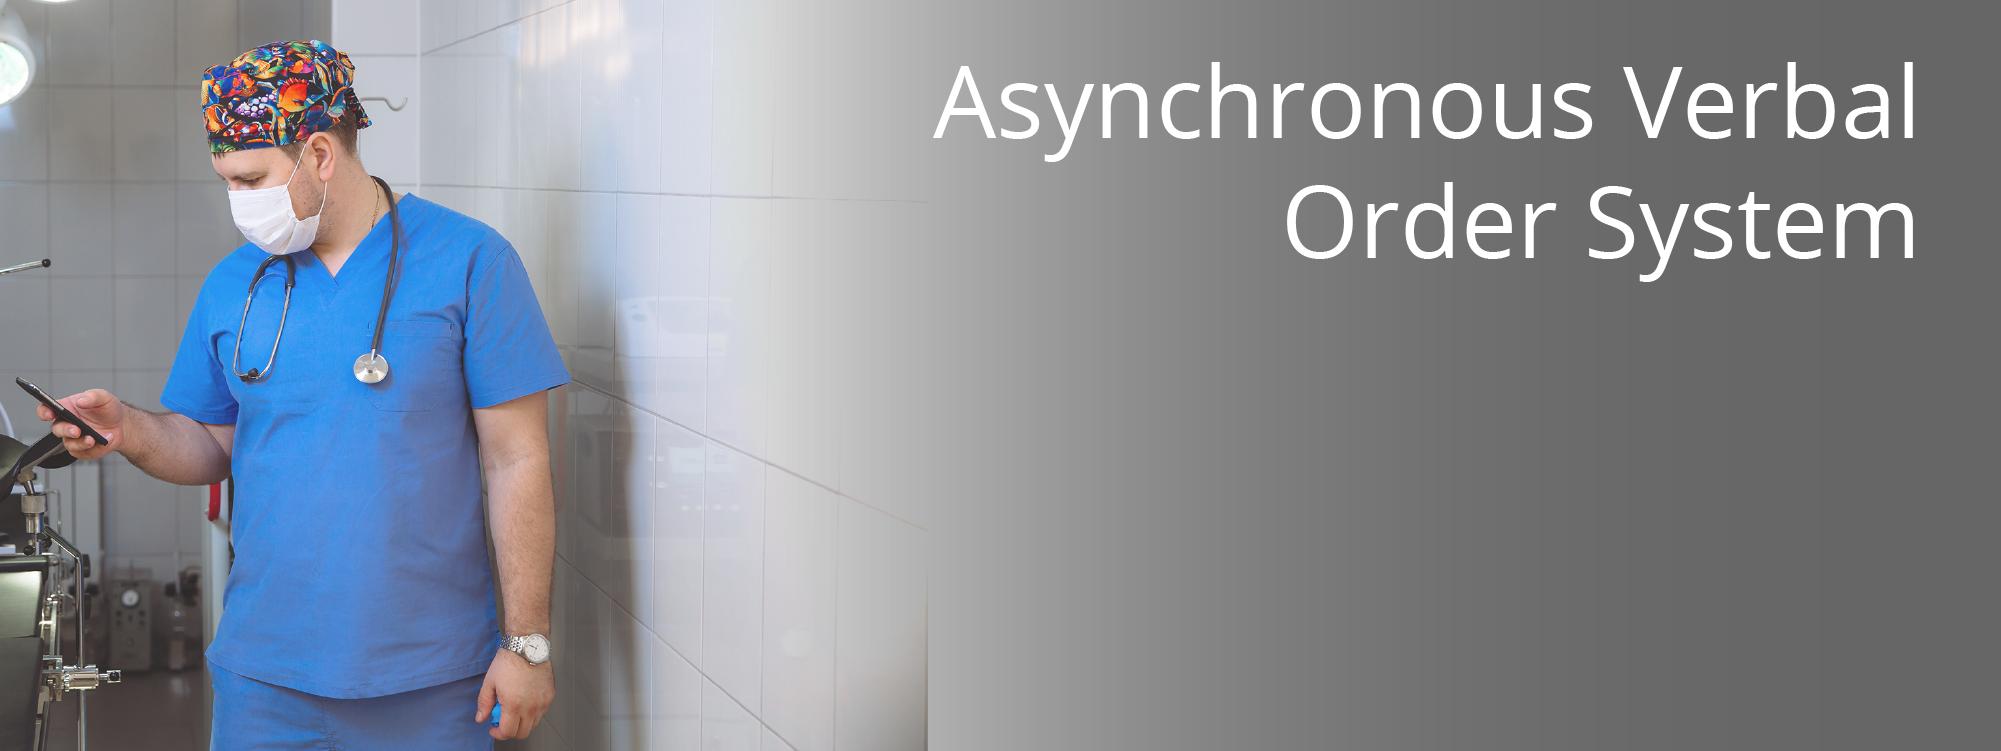 Telmediq Introduces Asynchronous Verbal Order System (AVOS)